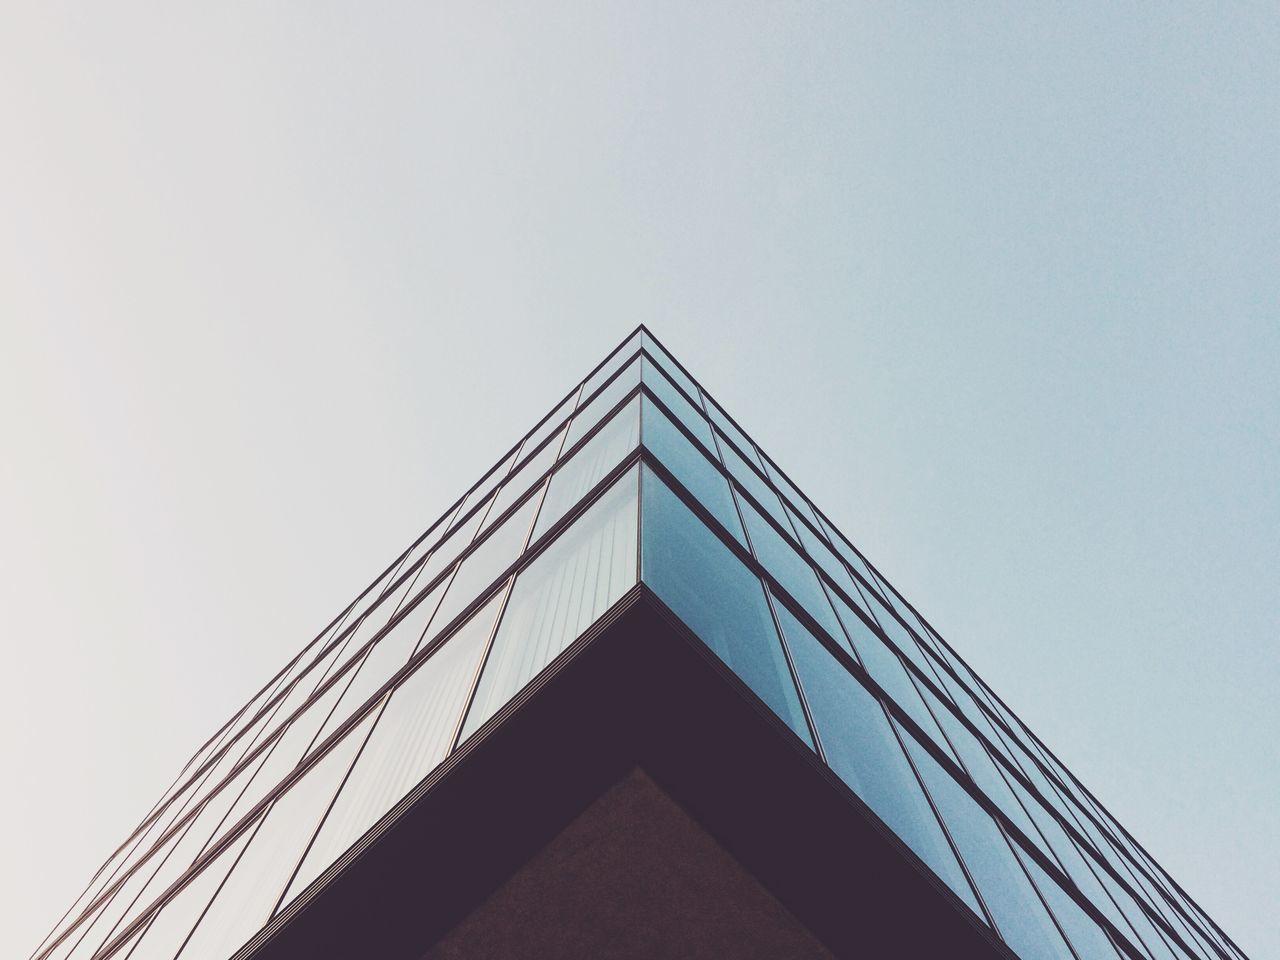 Corner of building against sky